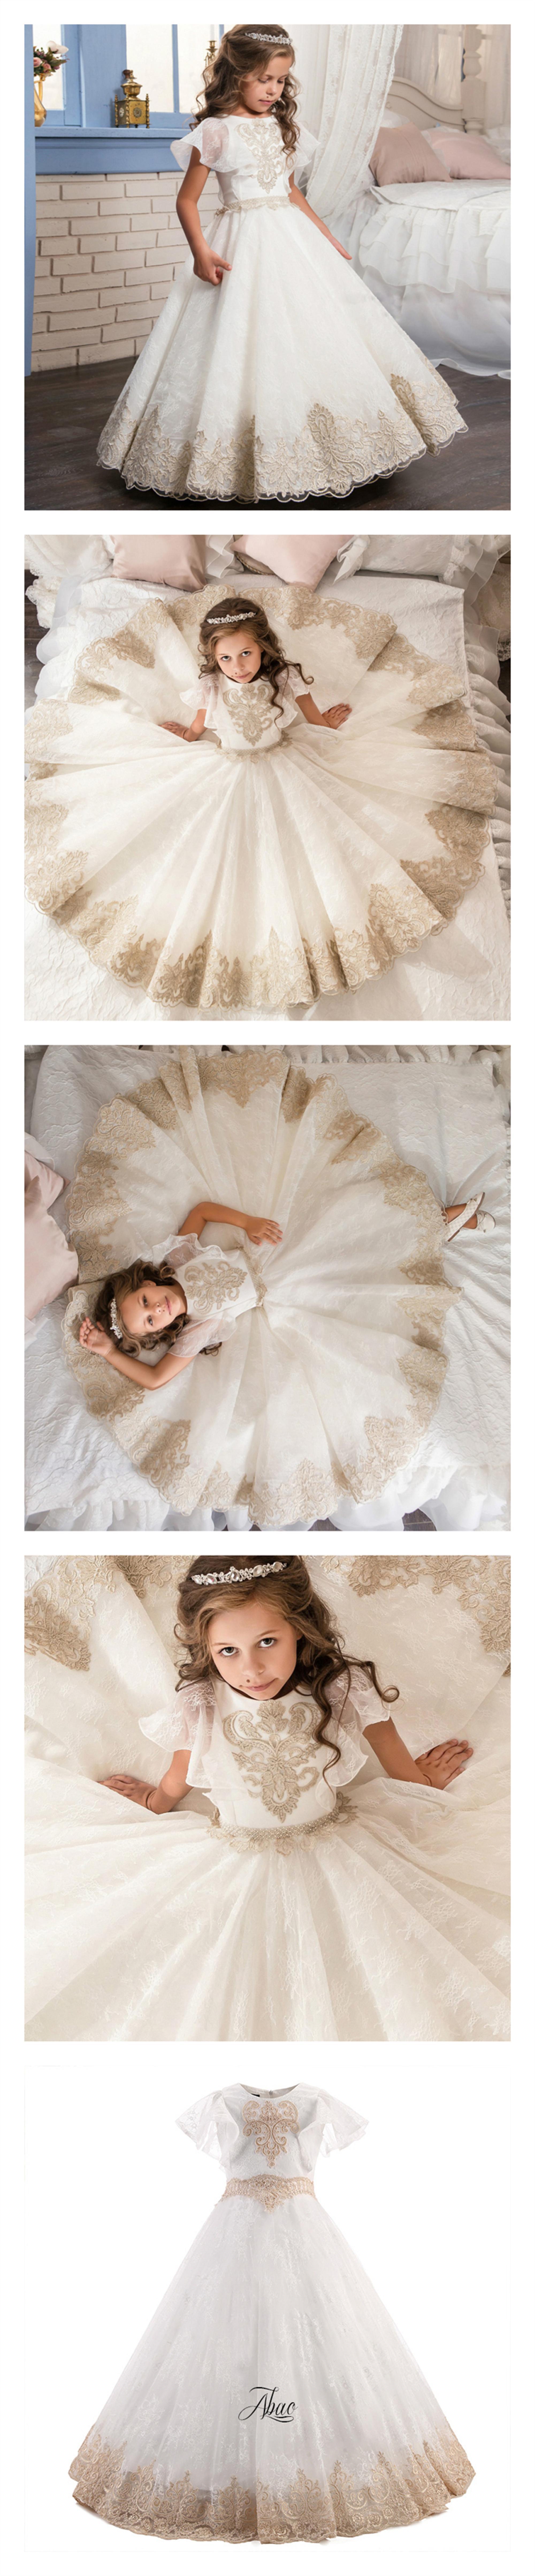 315a6d3e68c Boutique Wholesale Kids Girl Dress Wedding Prom Little Girls Ball Gowns  Flower Lace Bridesmaid Dresses